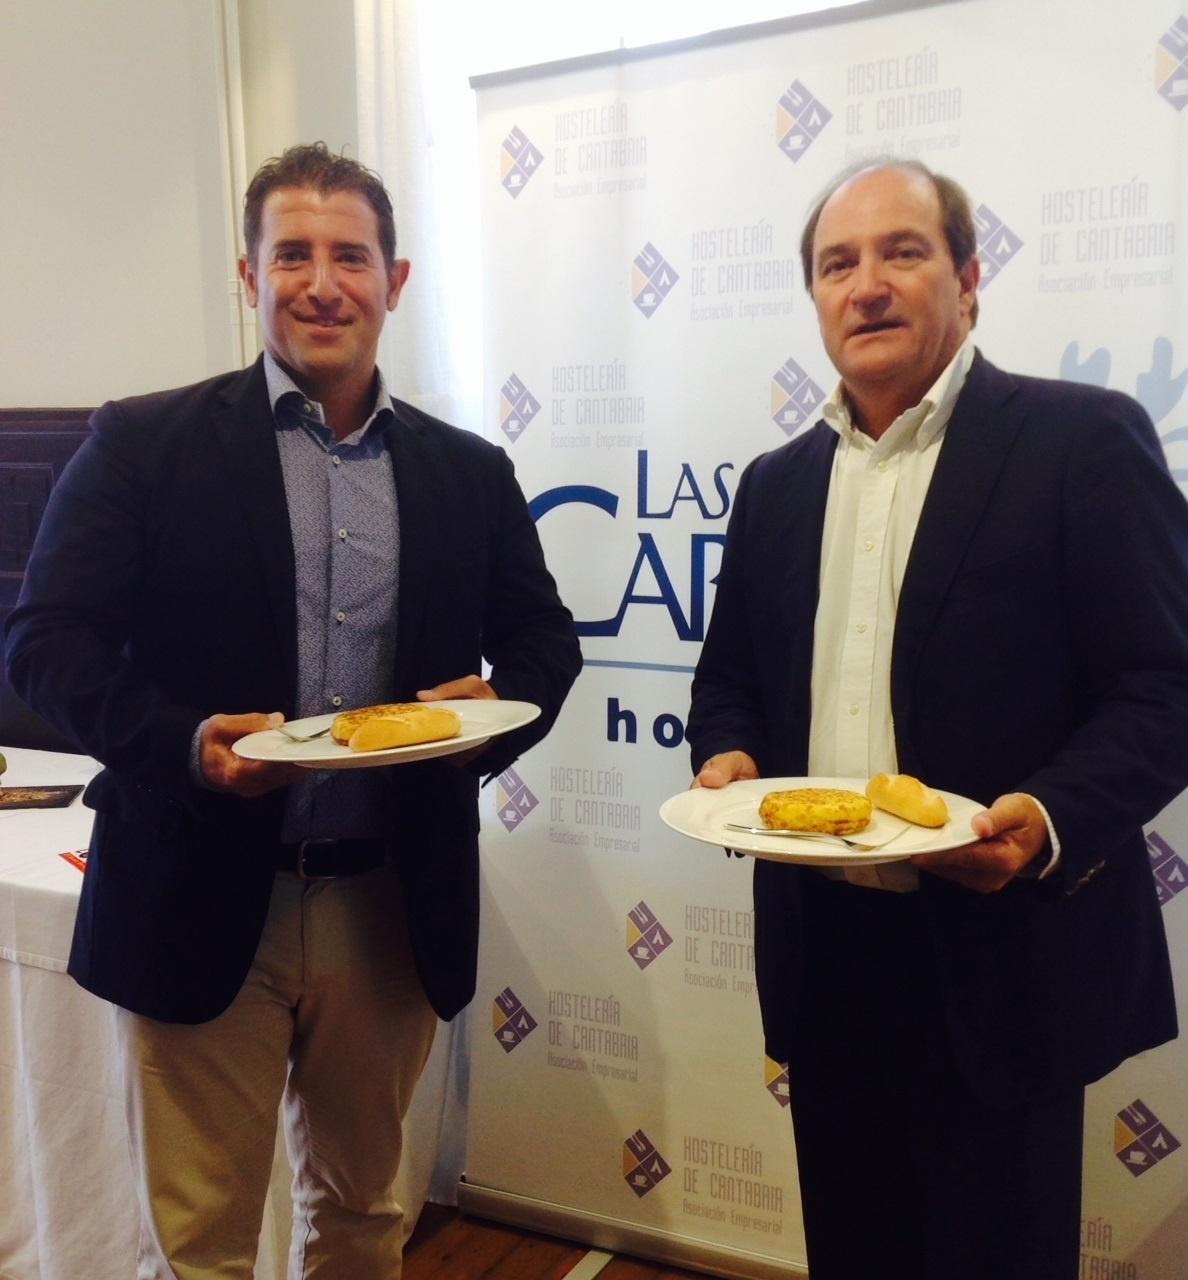 43 especialidades competirán en el I Concurso de Tortilla de Cantabria